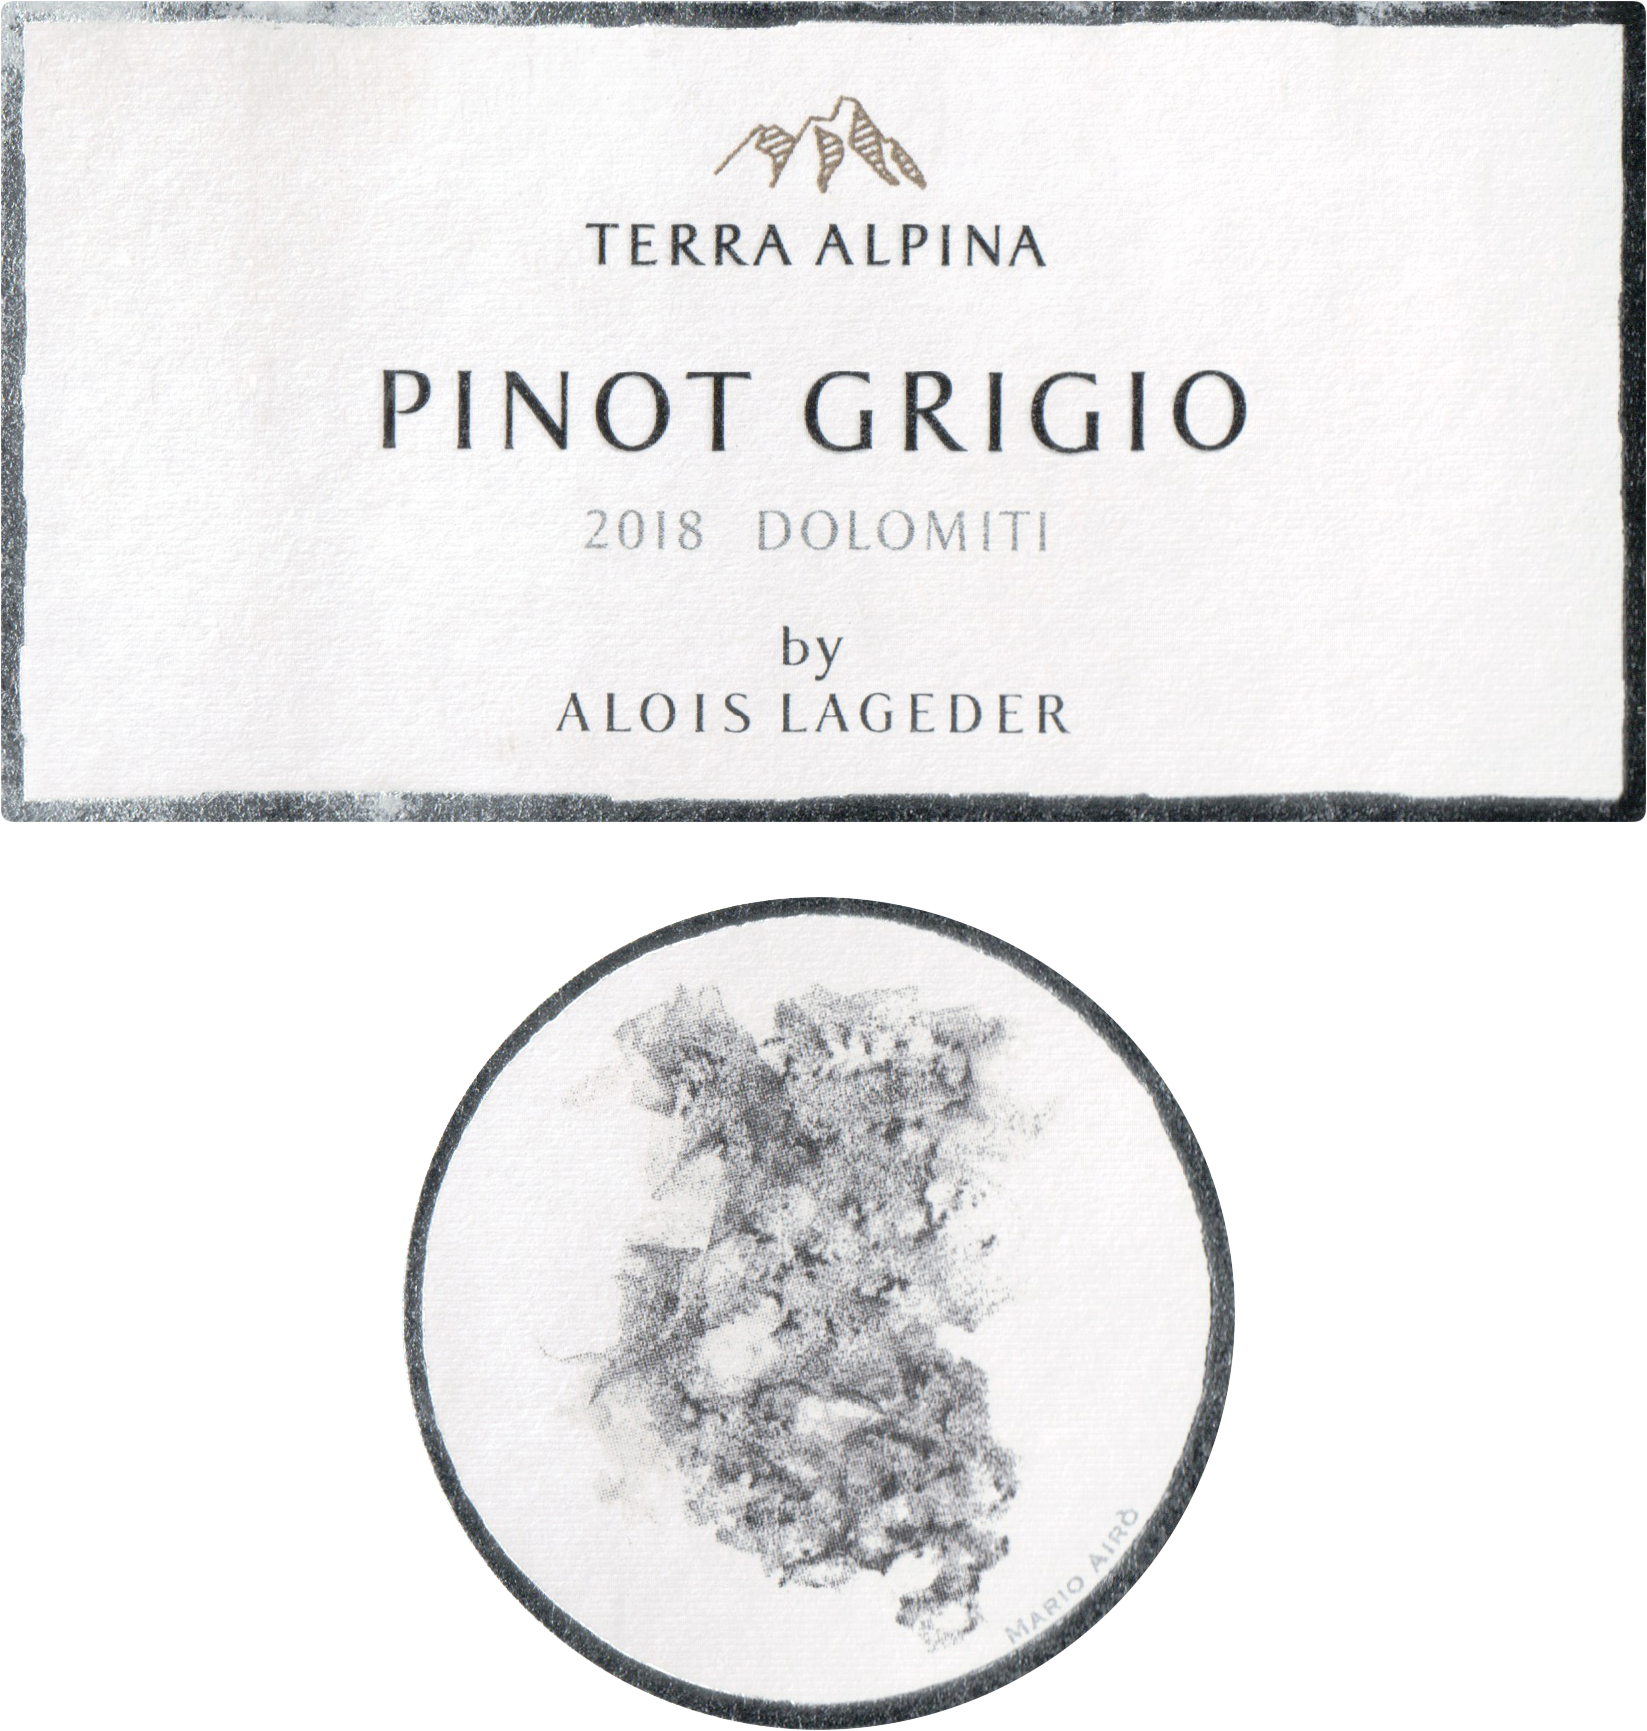 Alois Lageder Pinot Grigio 2018